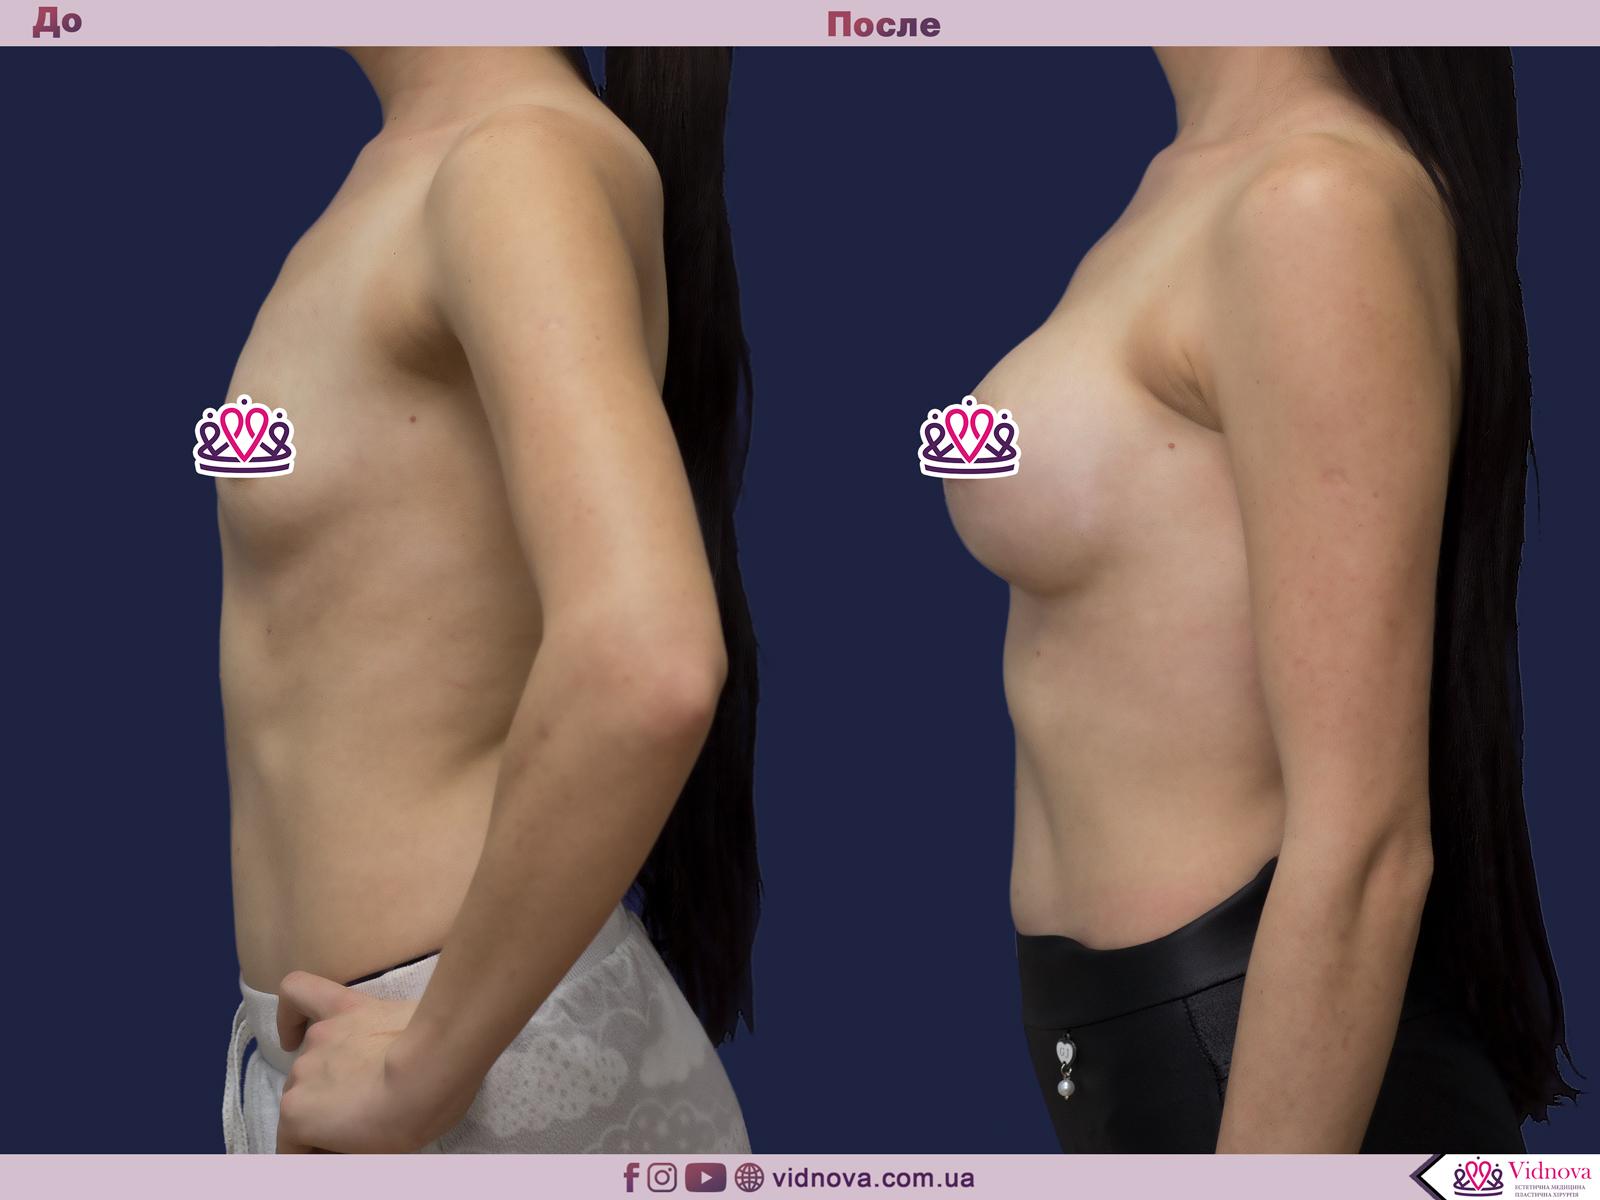 Увеличение груди: Фото ДО и ПОСЛЕ - Пример №79-3 - Клиника Vidnova